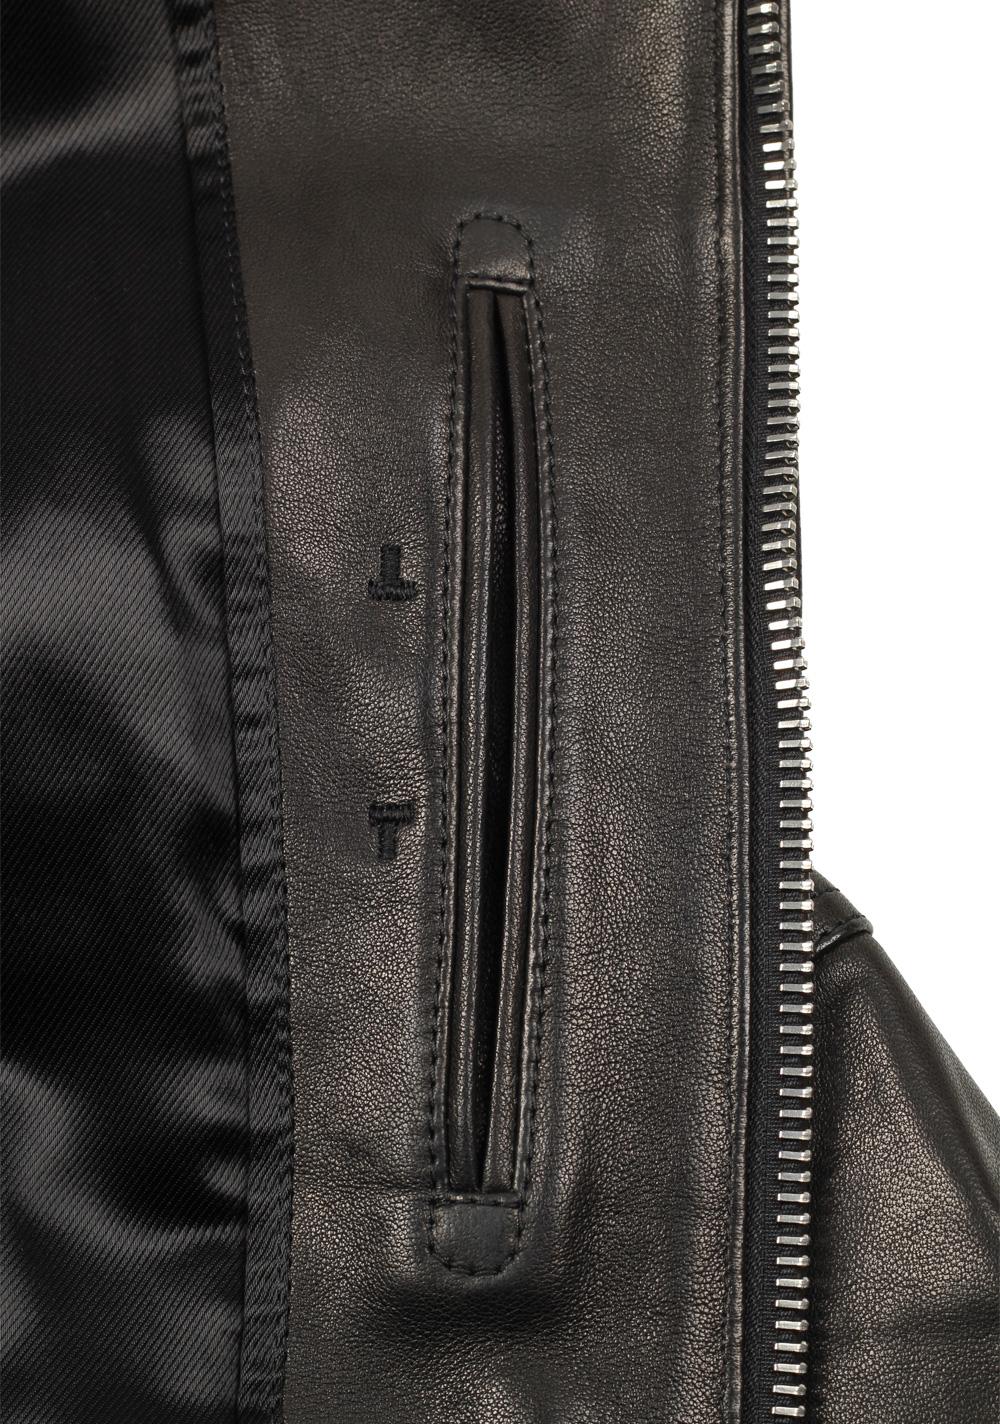 TOM FORD Leather Biker Jacket Coat Size 54 / 44R U.S. Outerwear | Costume Limité